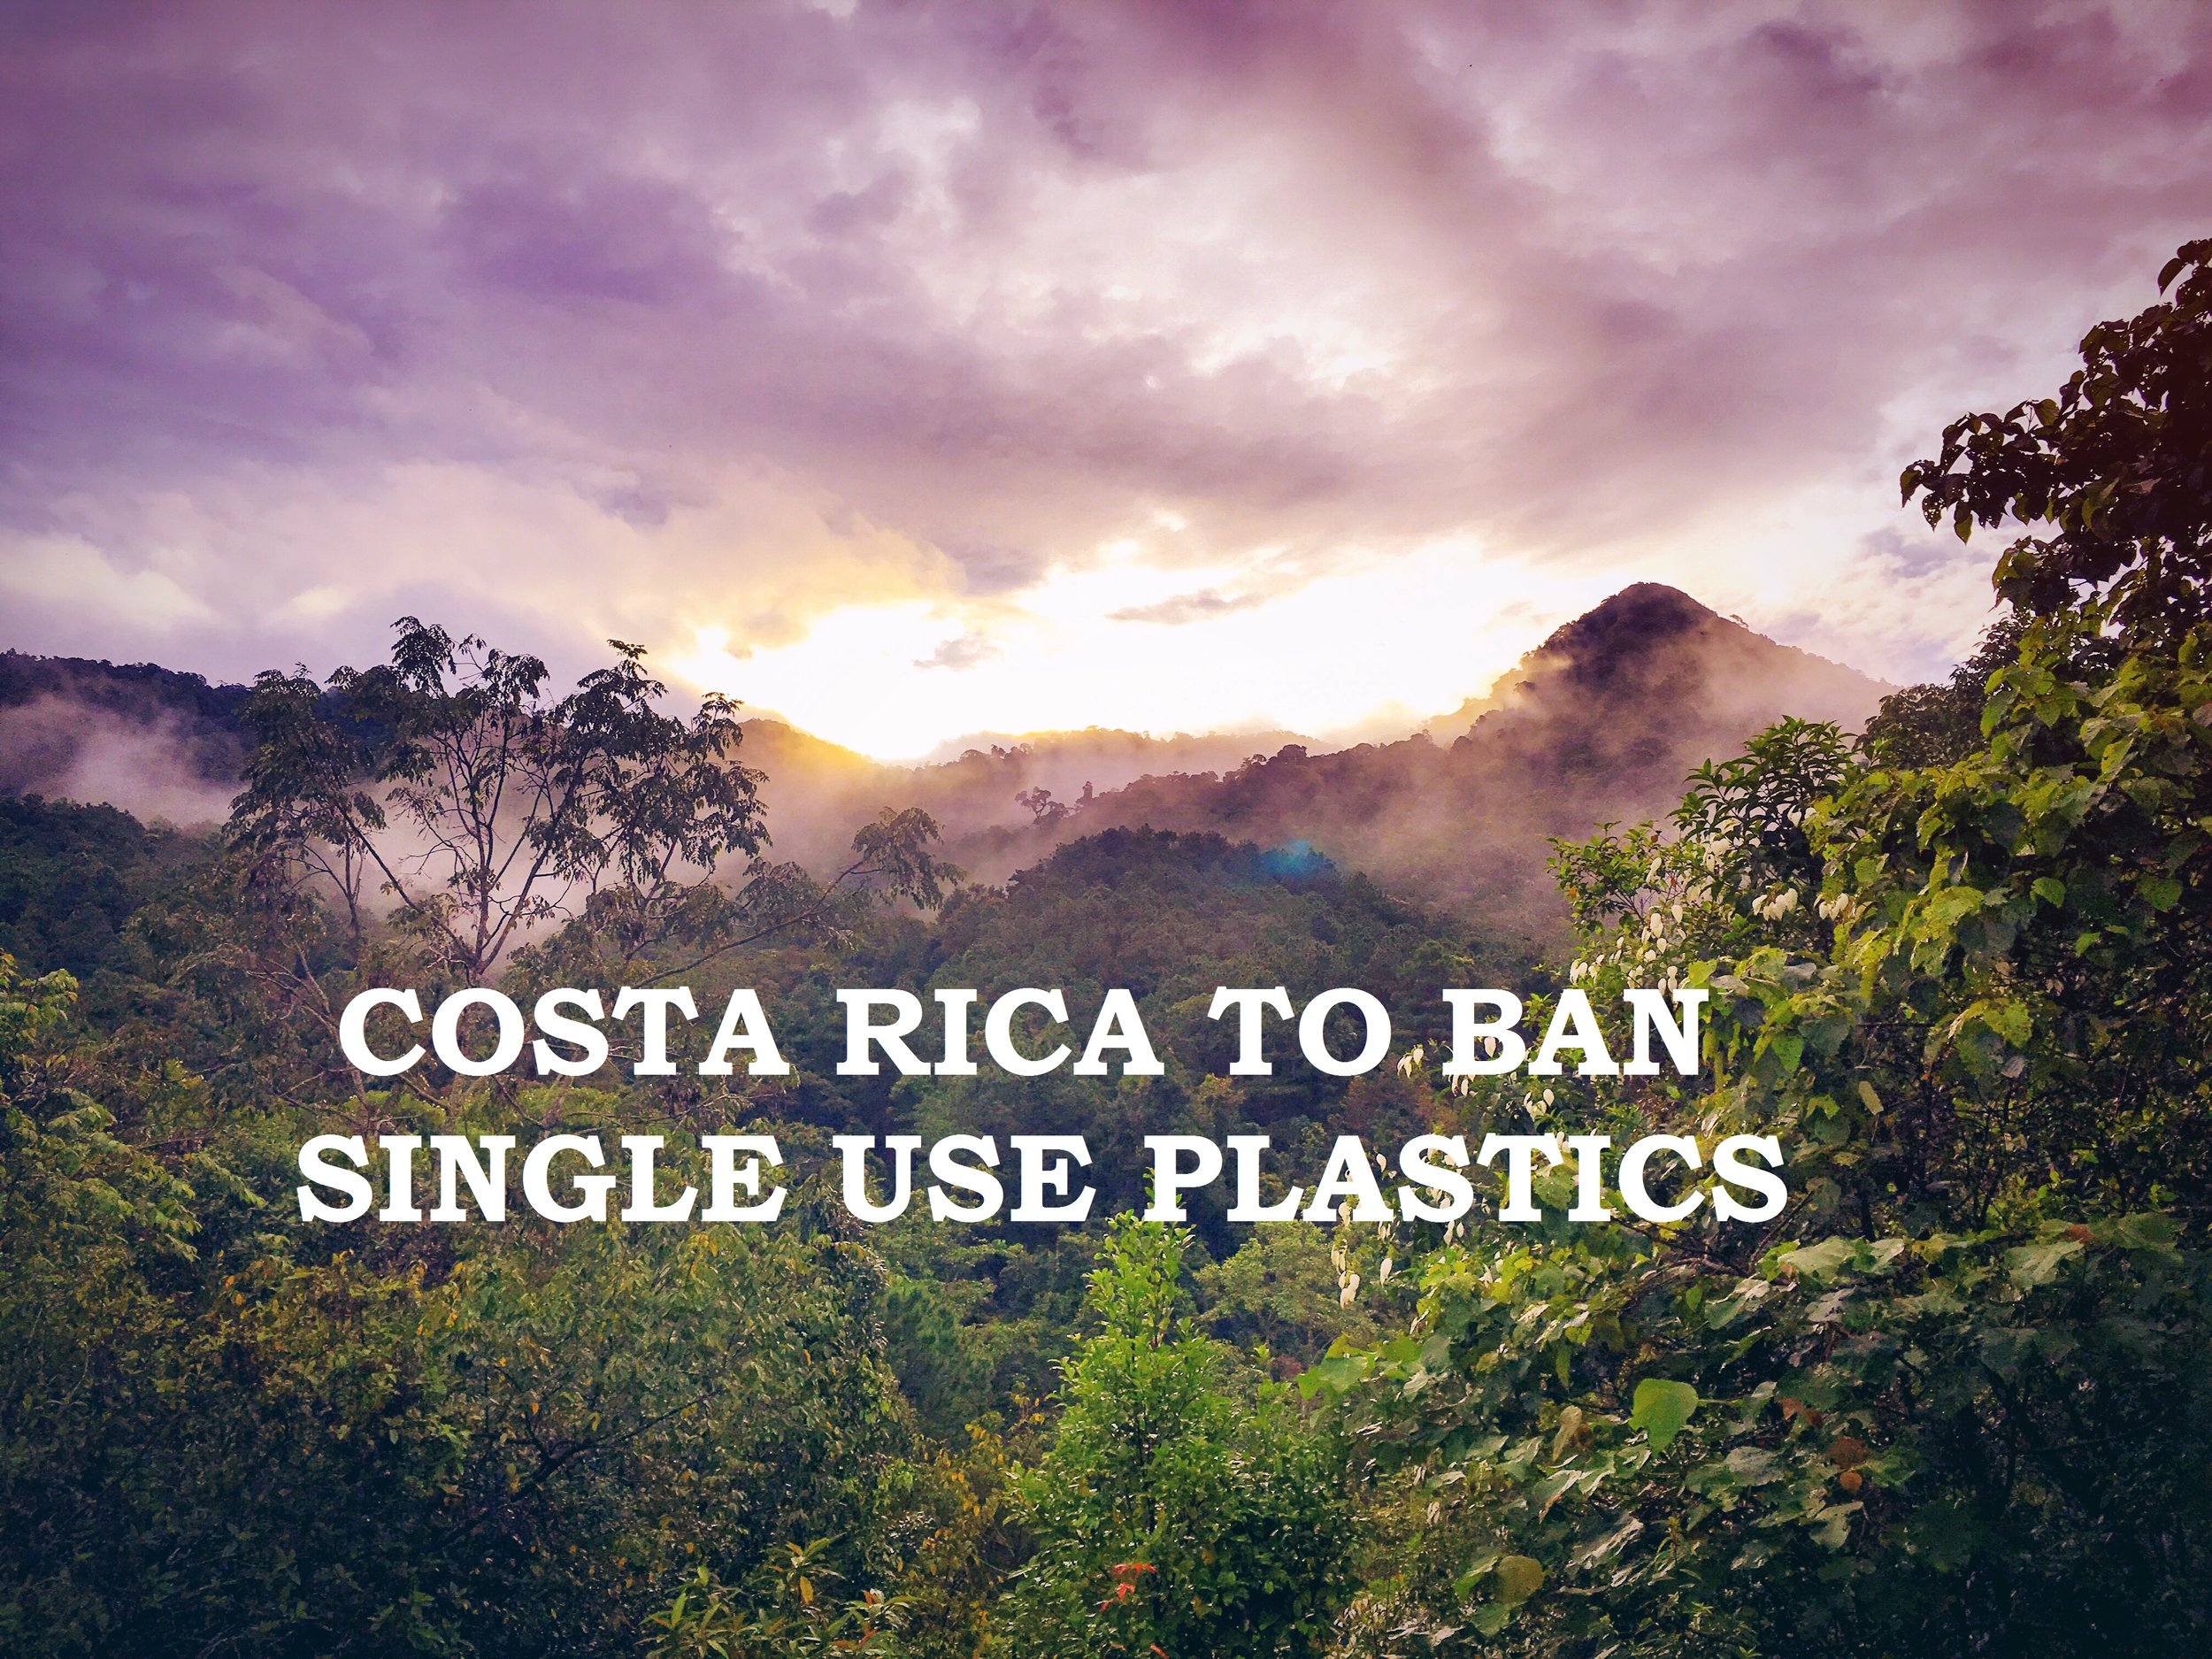 Costa Rica To Ban Single Use Plastics.jpg